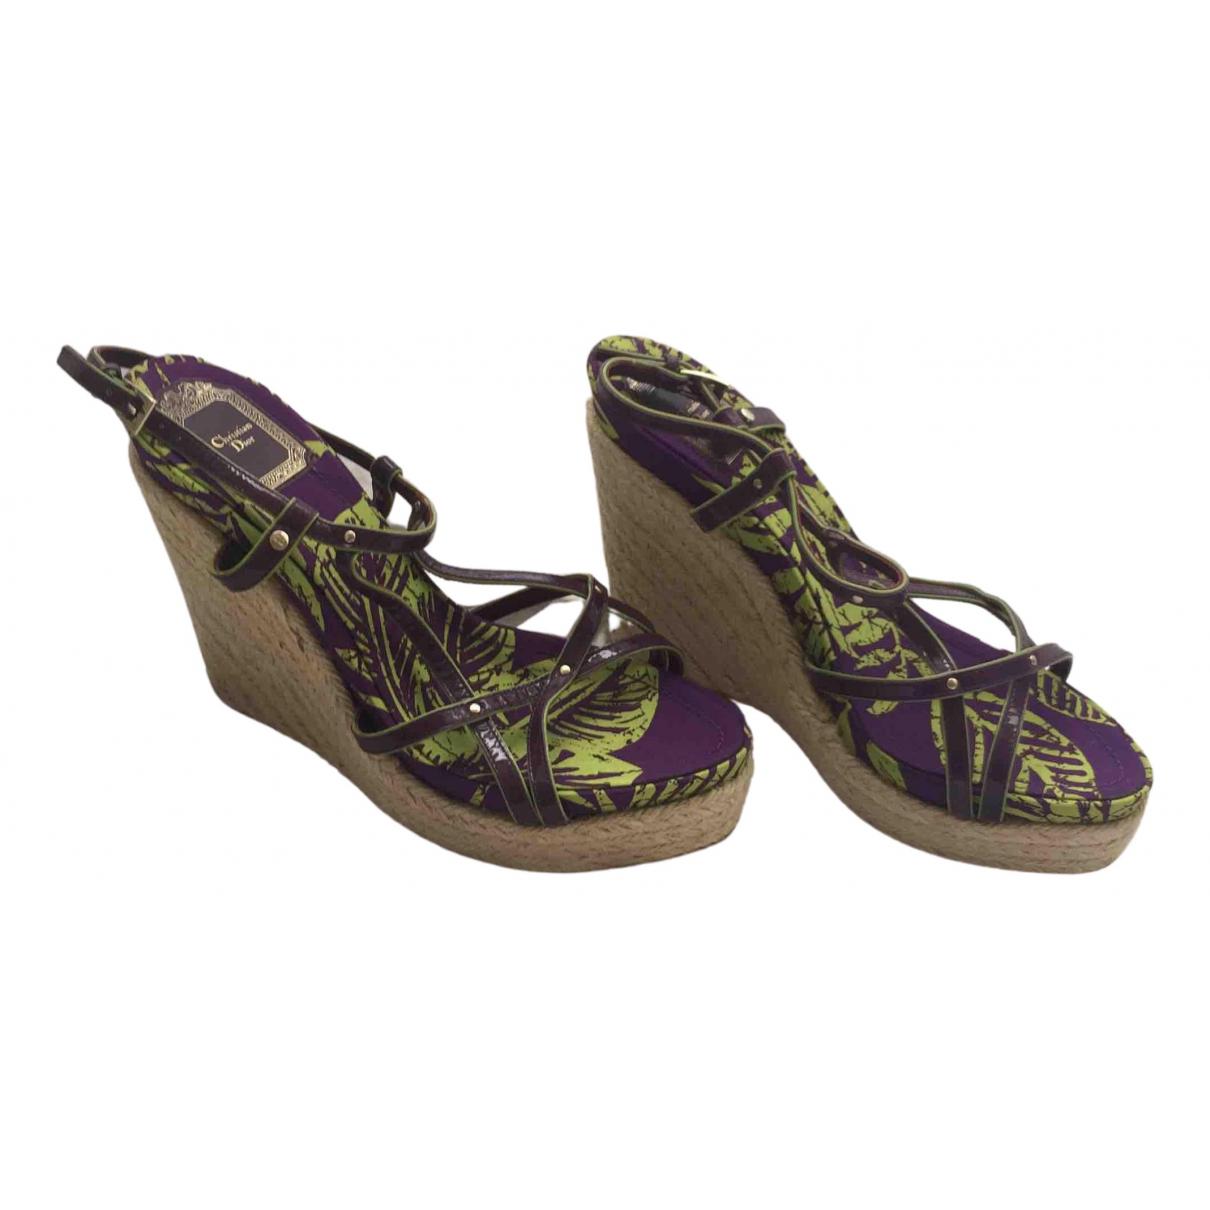 Christian Dior - Sandales   pour femme en cuir verni - violet